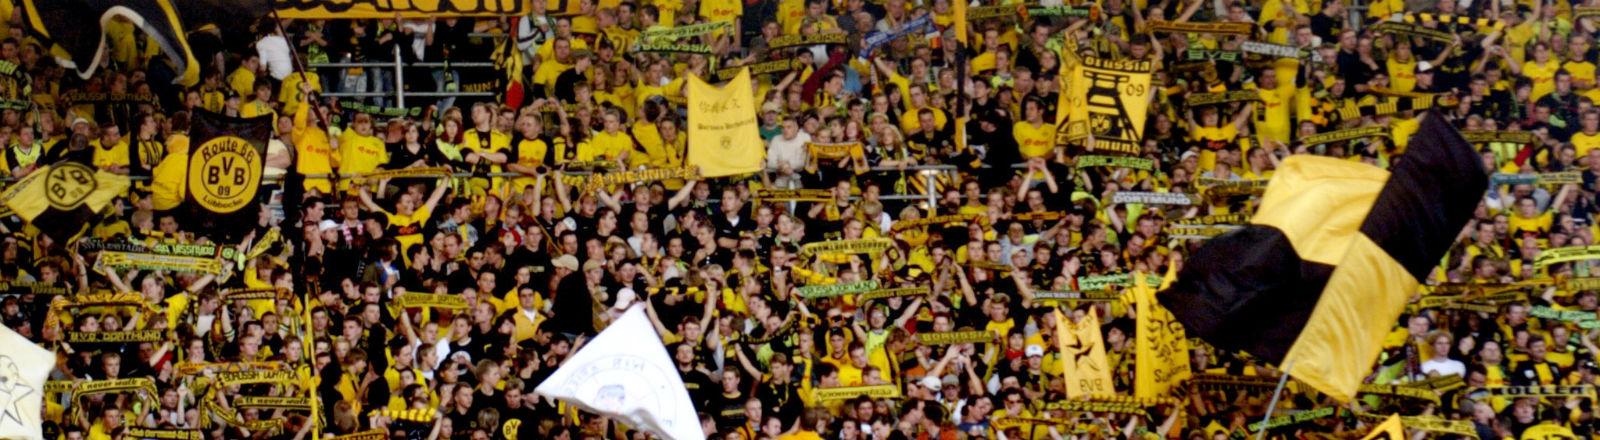 Der Fanblock im Dortmunder Westfalenstadion. Bild: dpa